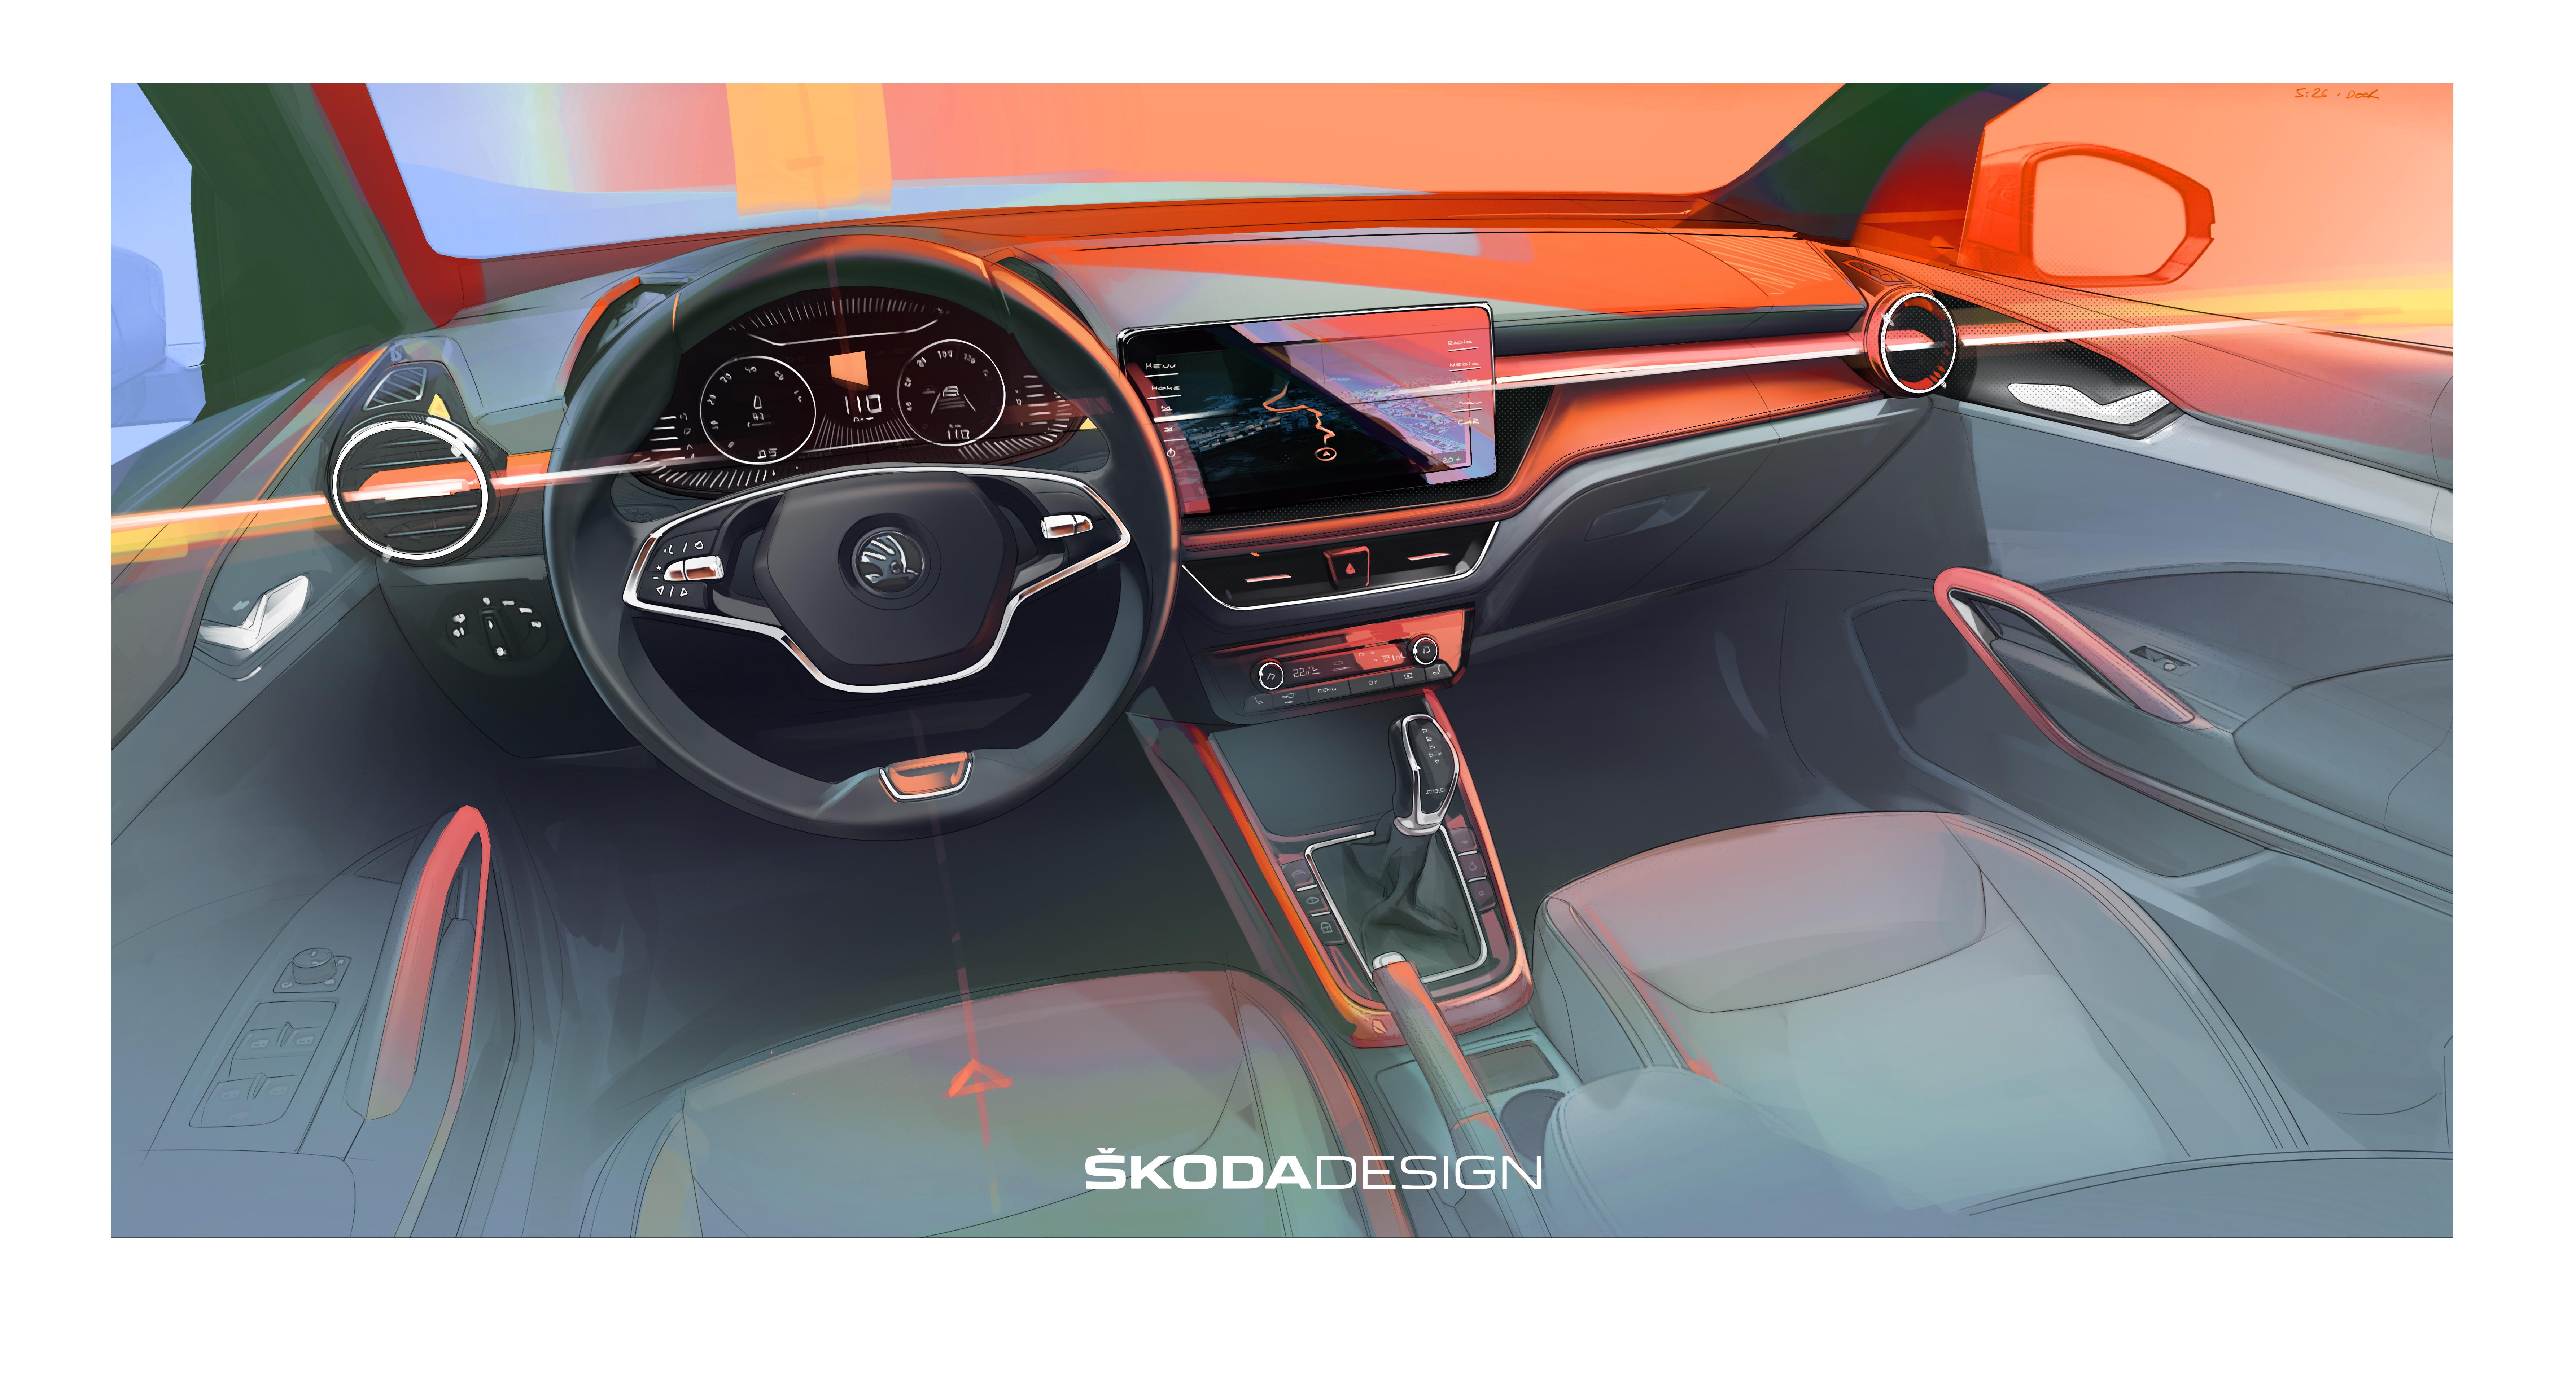 First impression of the new SKODA FABIA's interior - Image 2